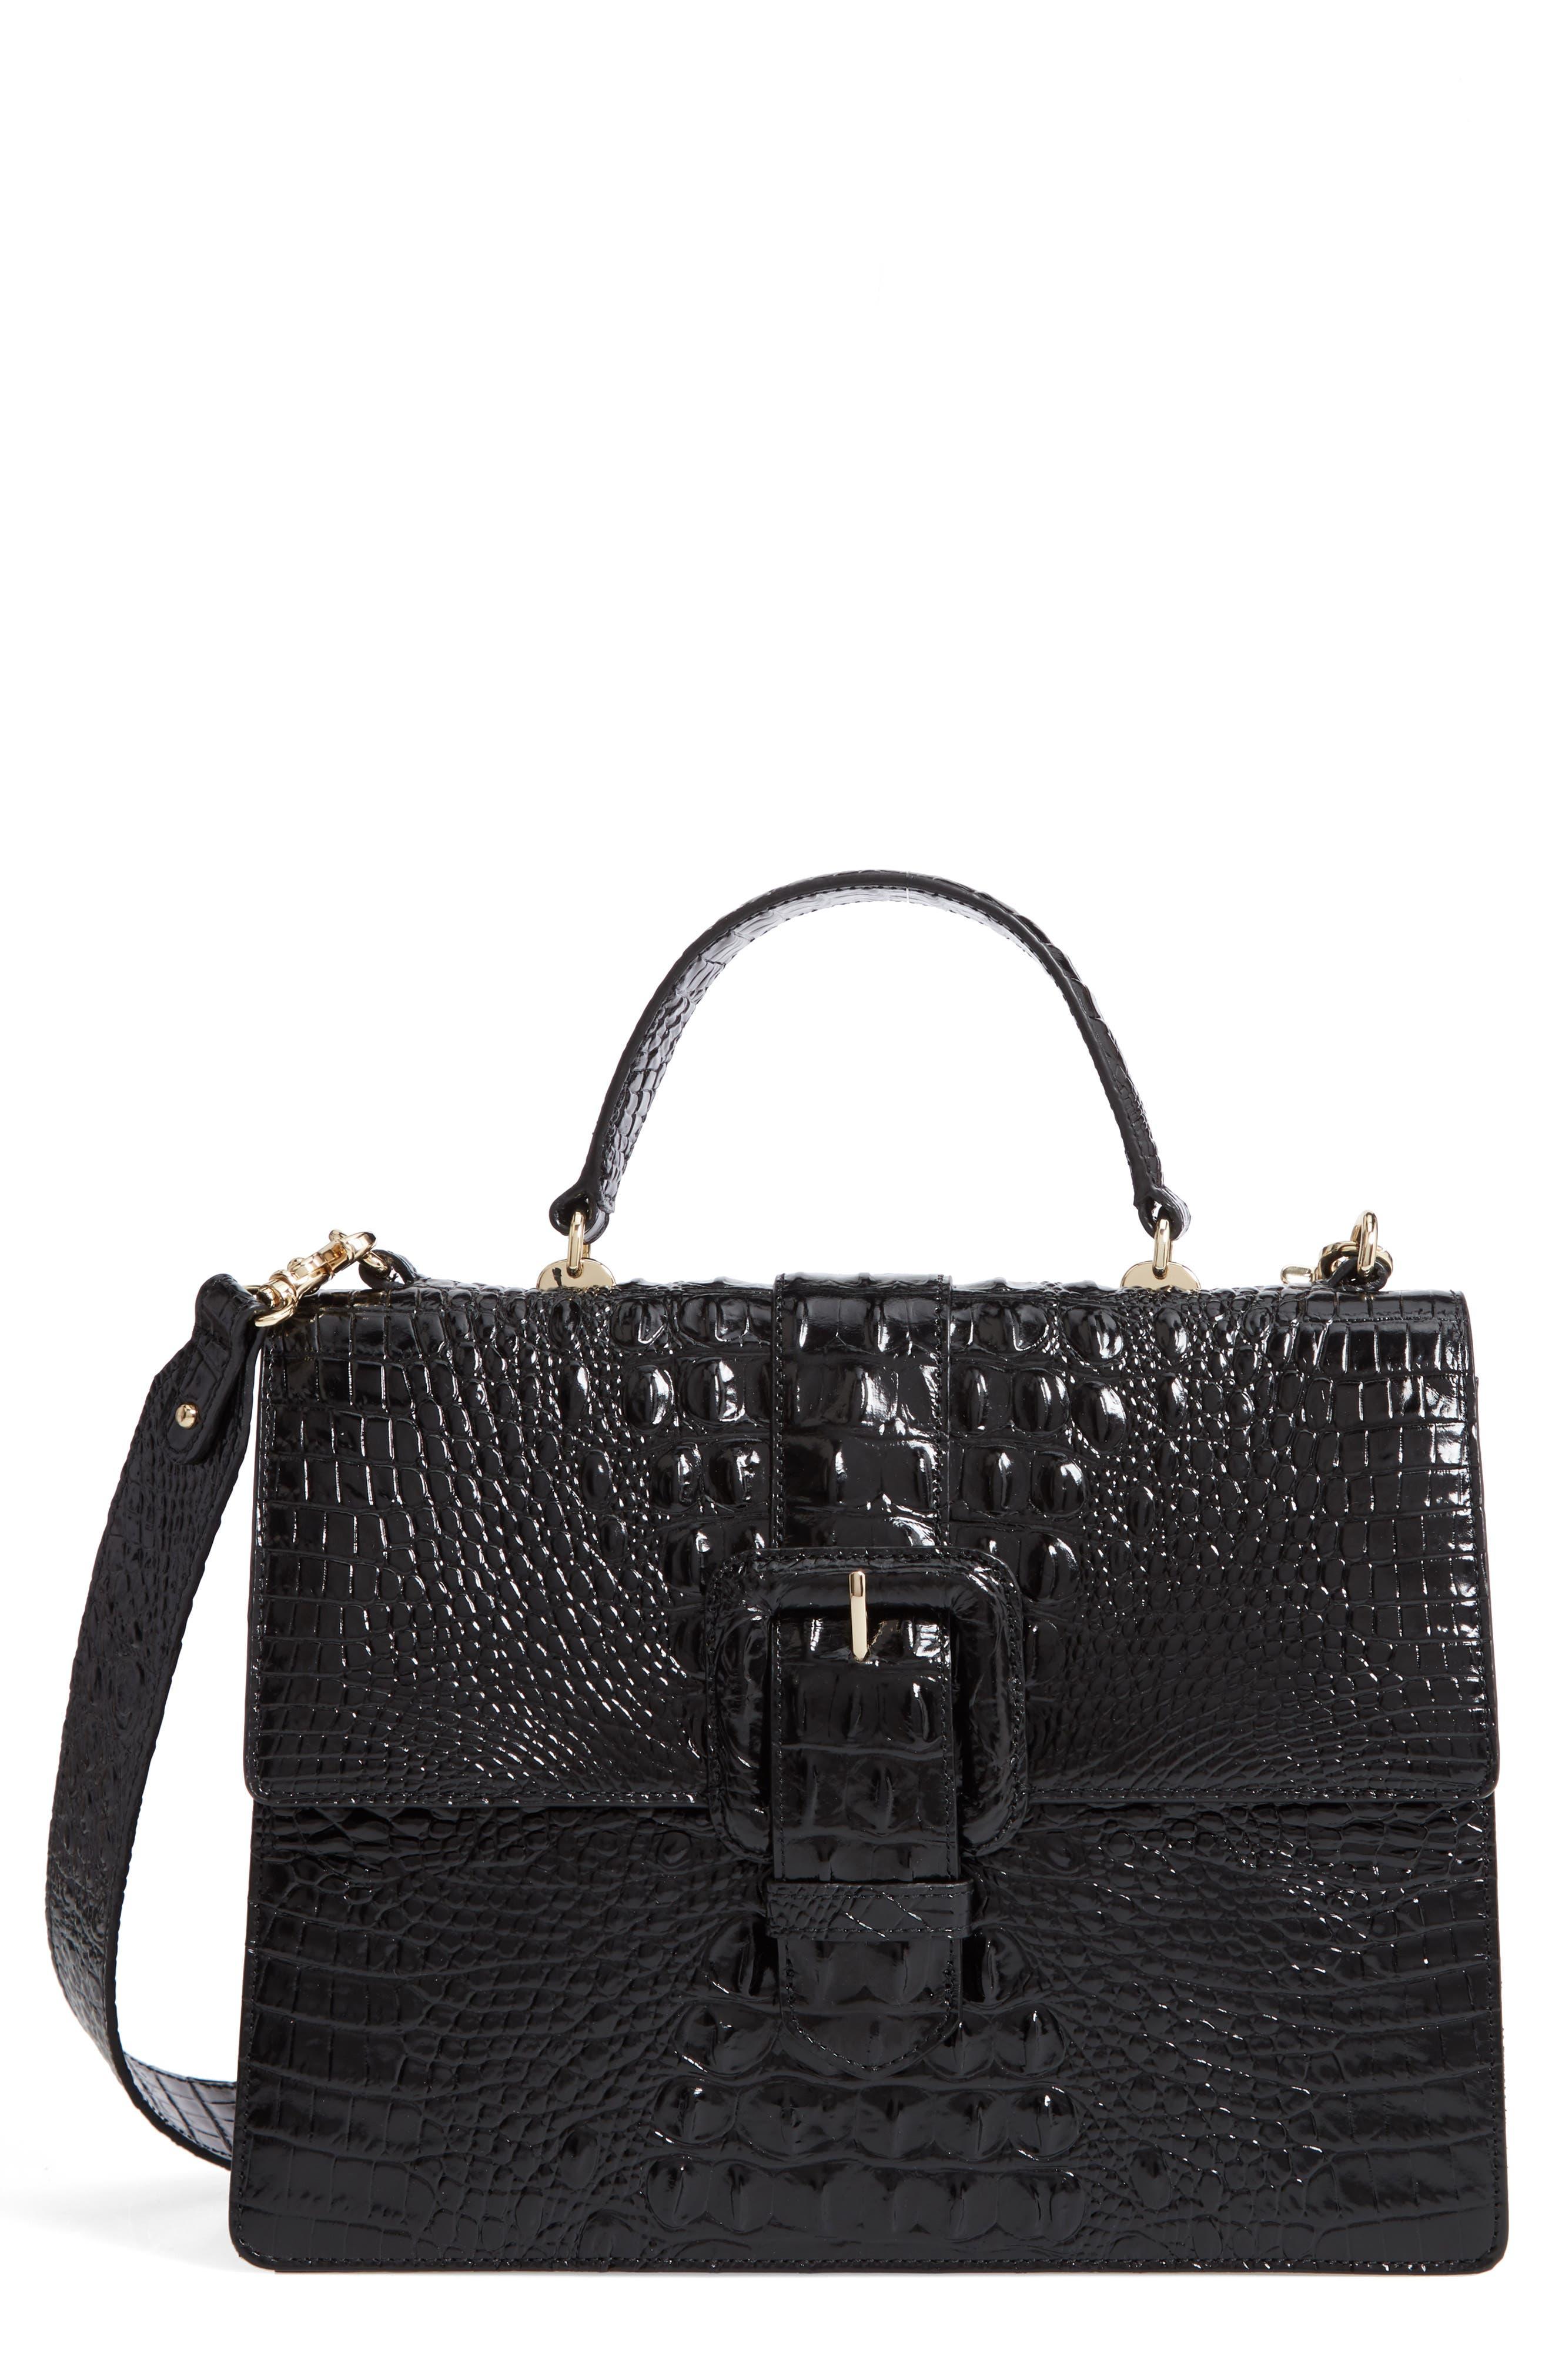 Medium Francine Croc Embossed Leather Satchel,                         Main,                         color, BLACK